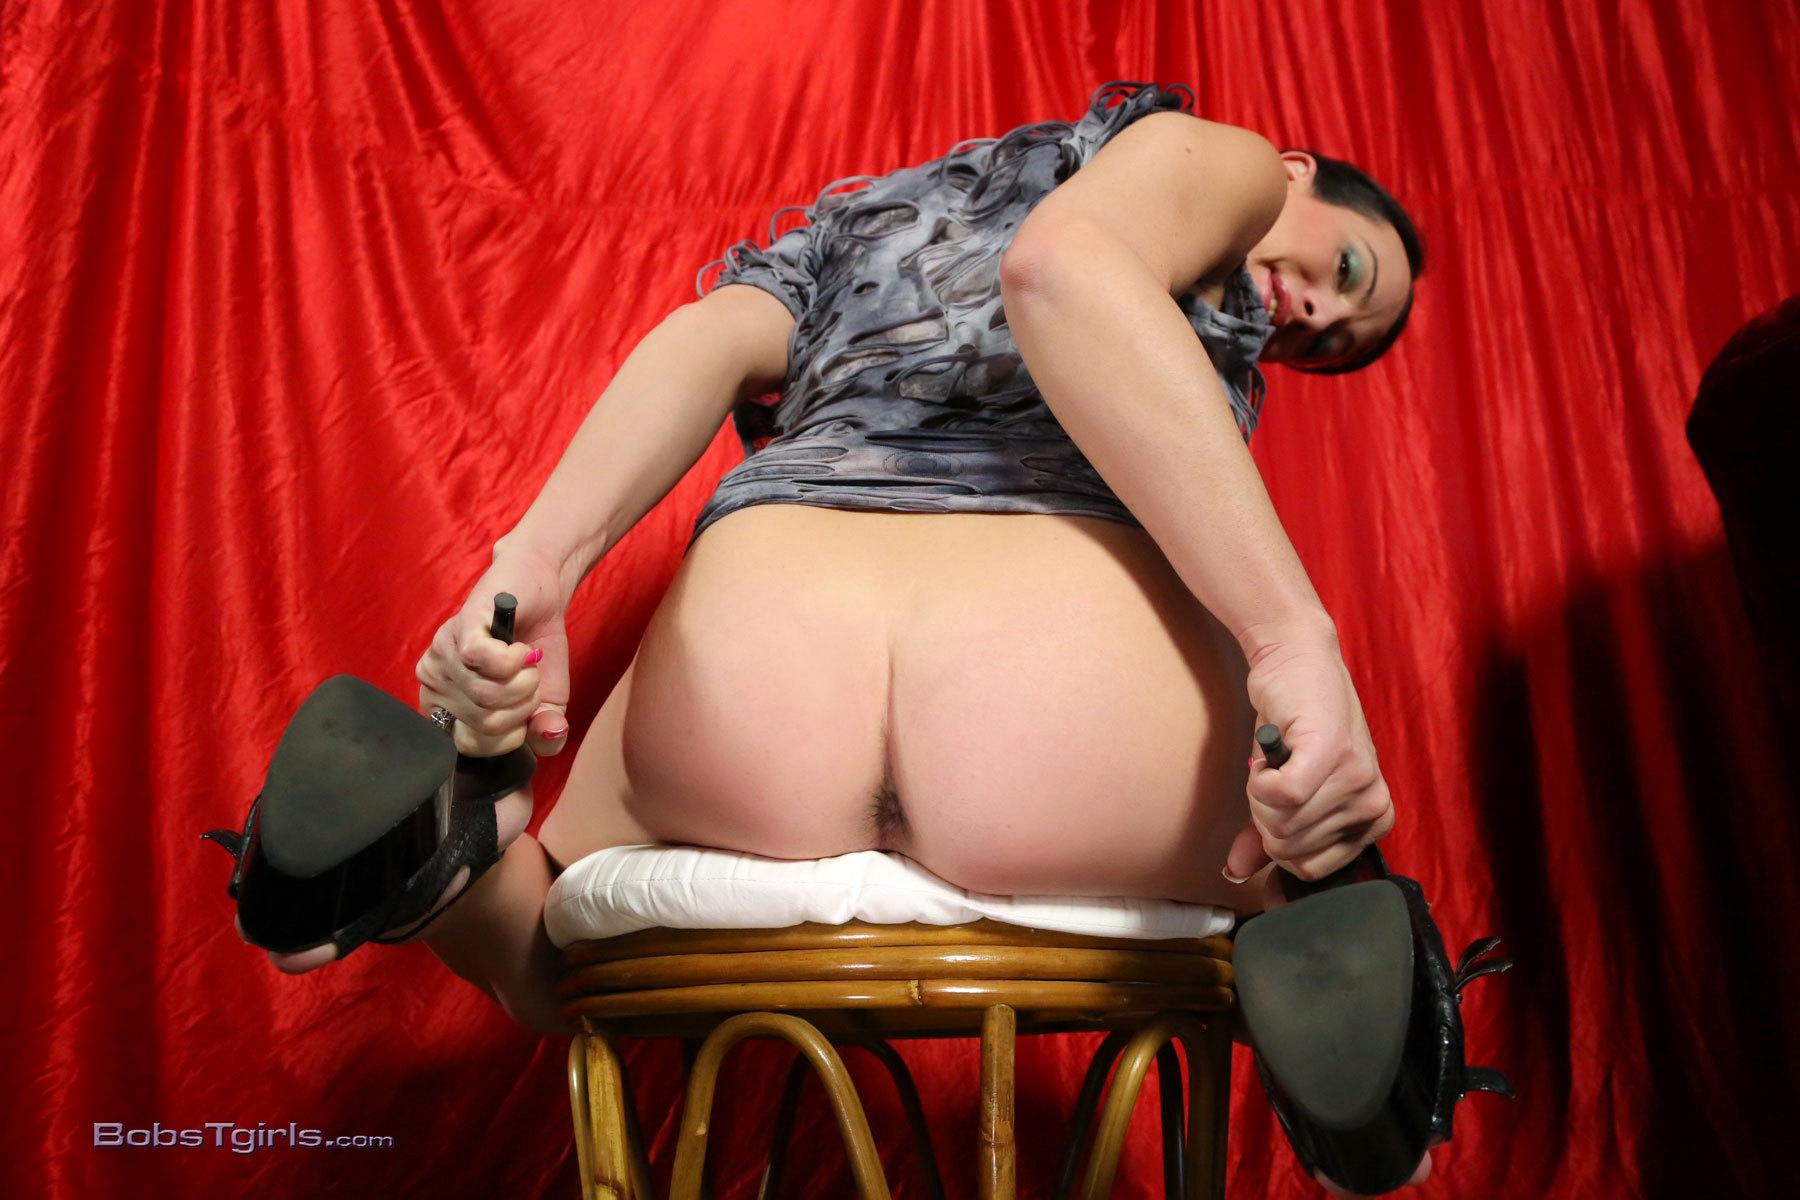 Danika Milking Her Enormous Cock